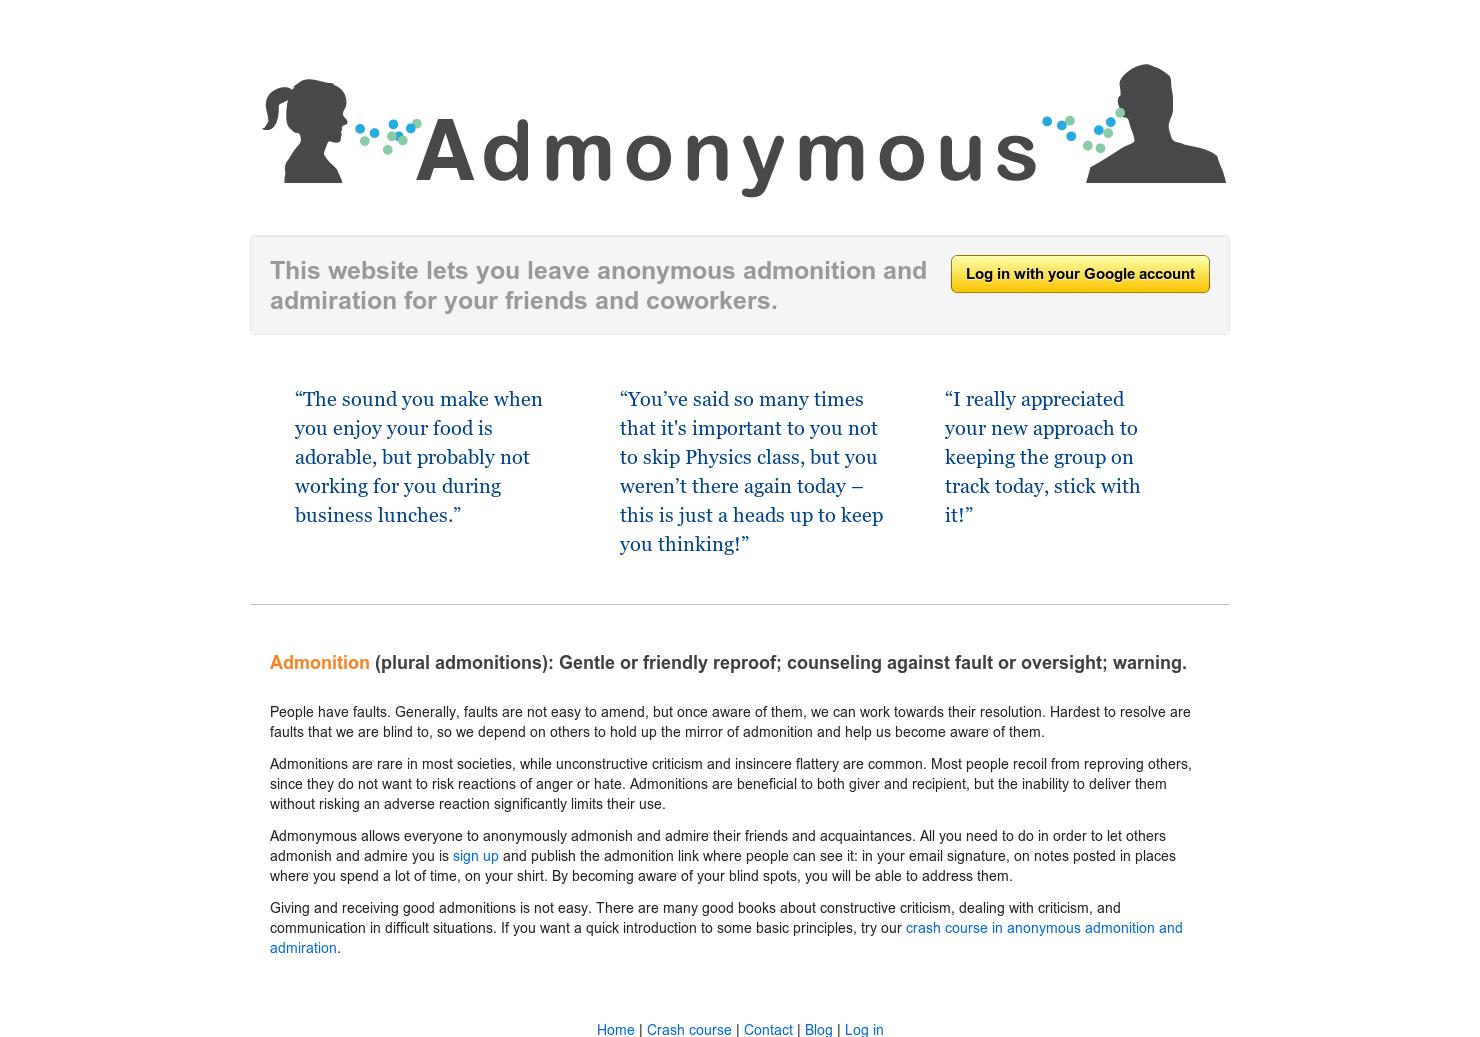 Admonymous - 4Chan Anon + HonestyBox | Product Hunt